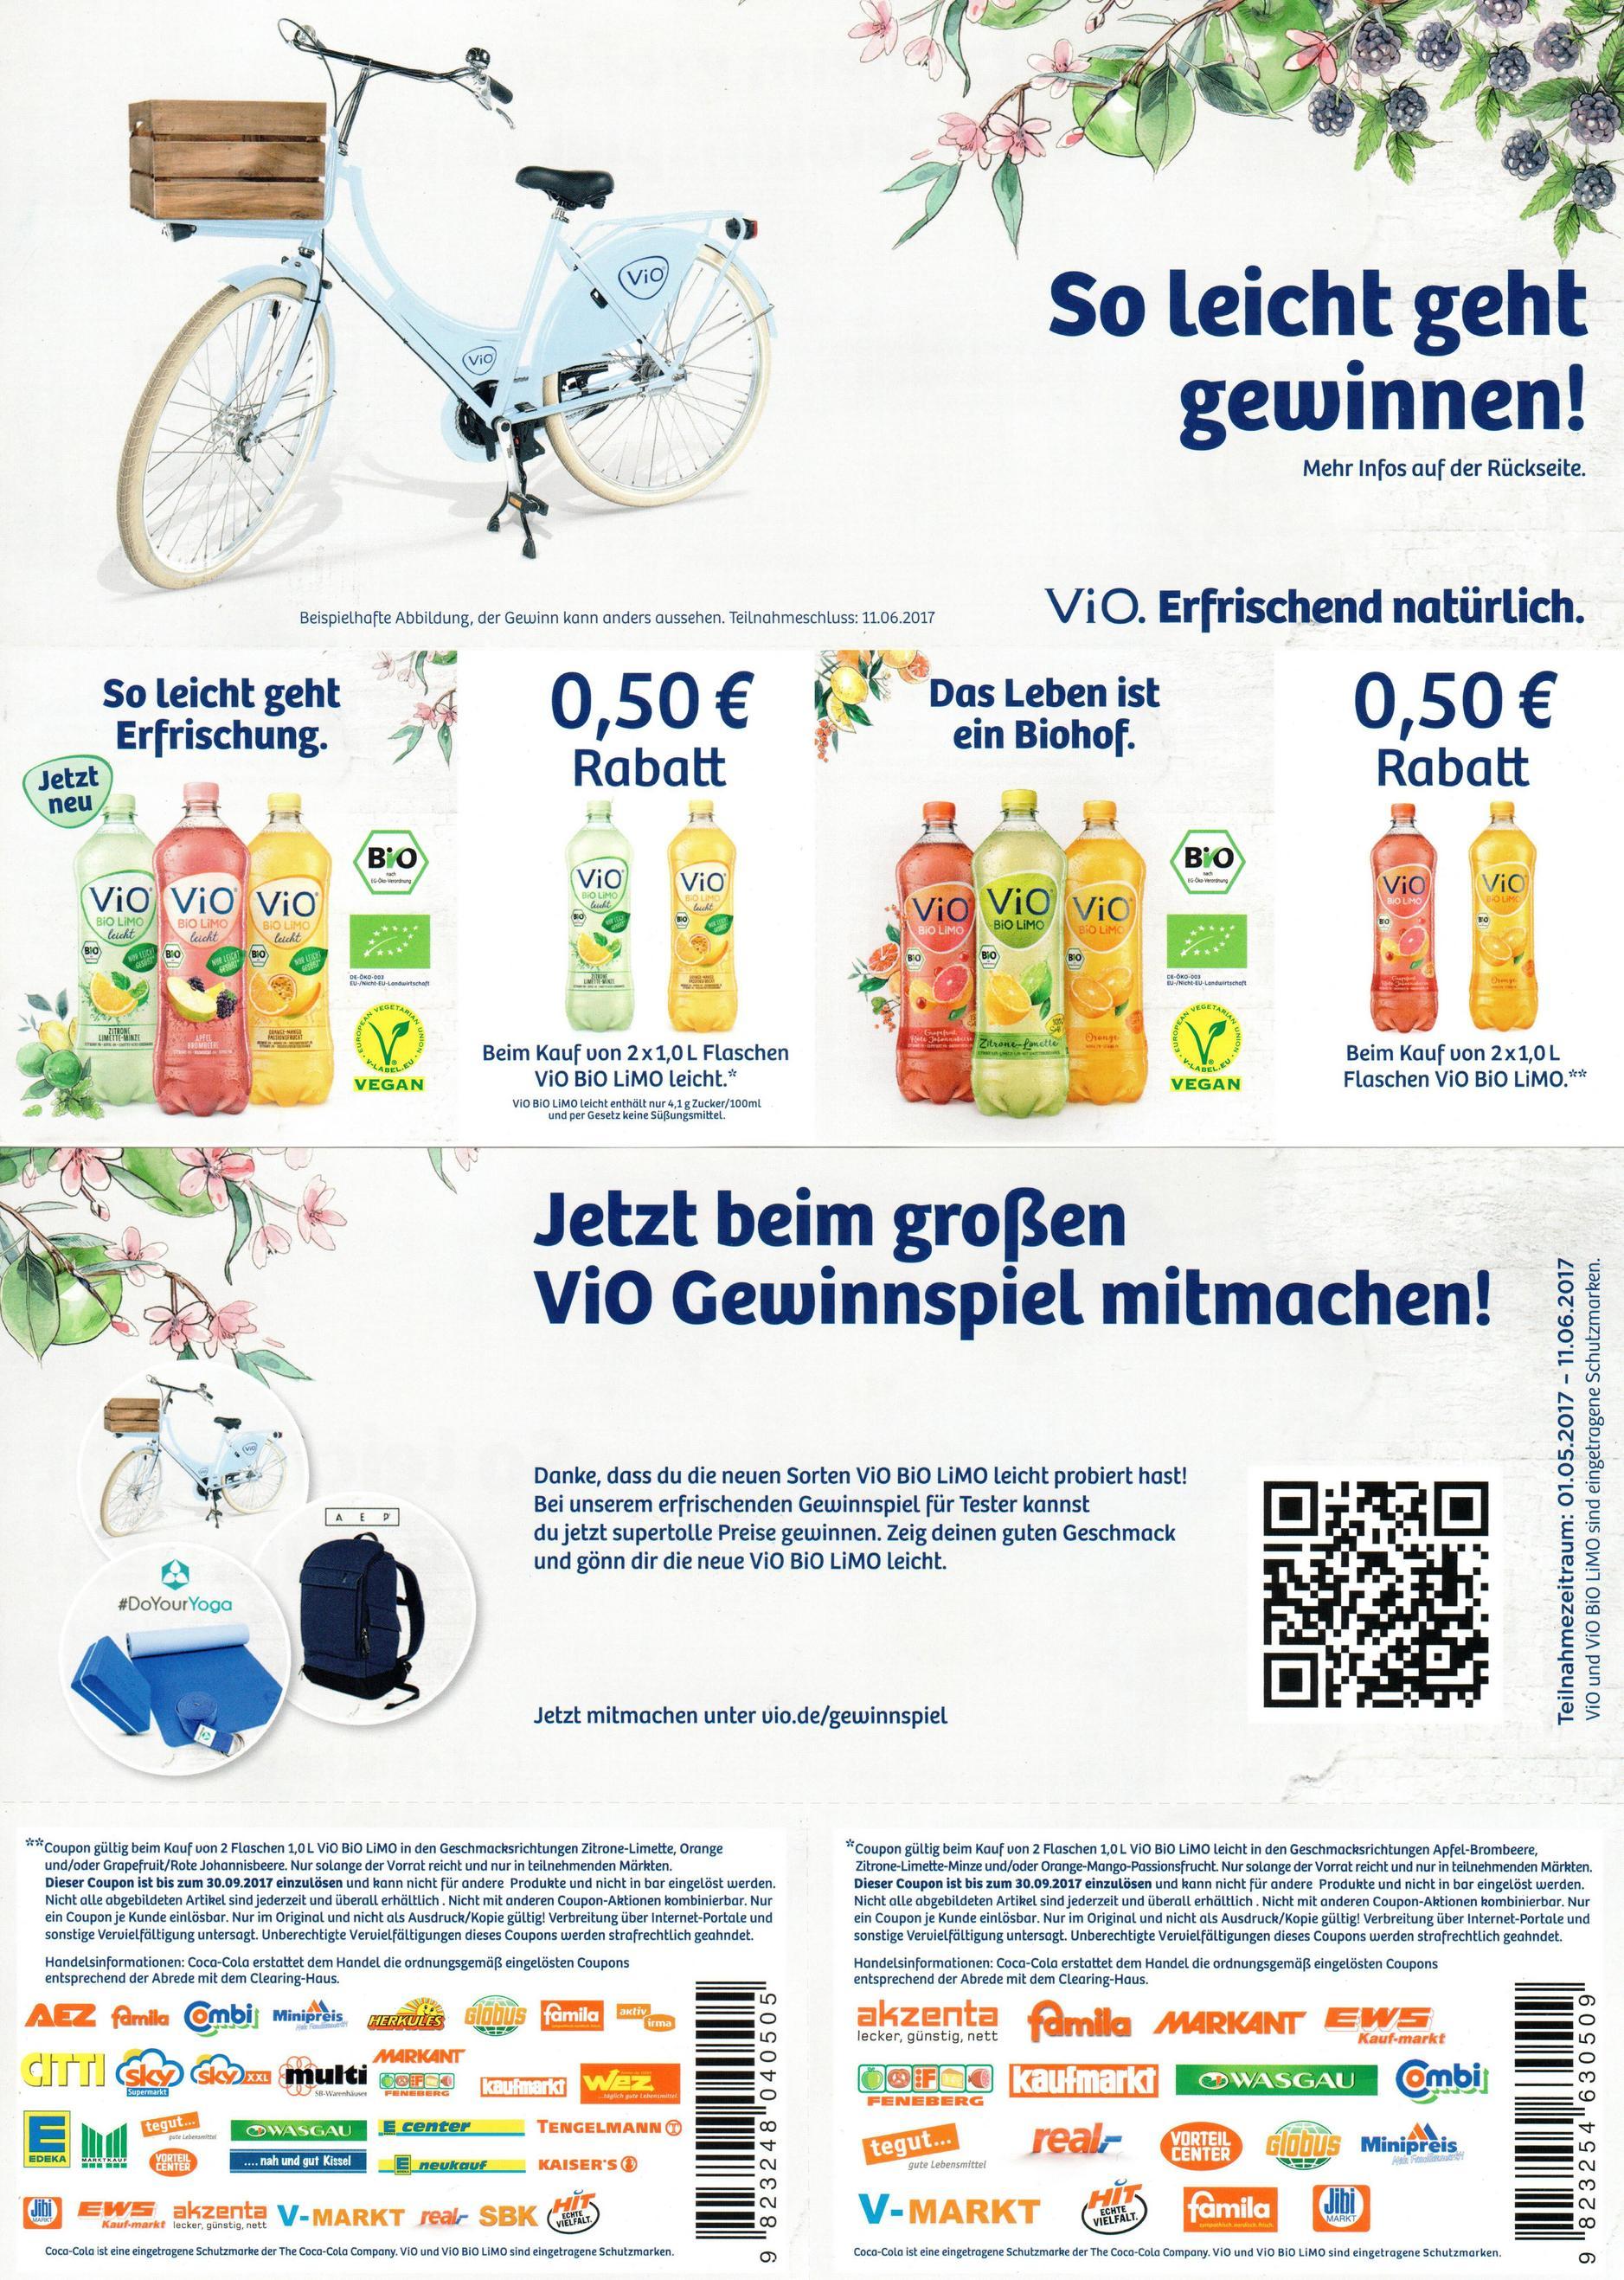 2 Sofort-Rabatt-Coupons für 2x Vio Bio Limo 1,0l bis 30.09.2017